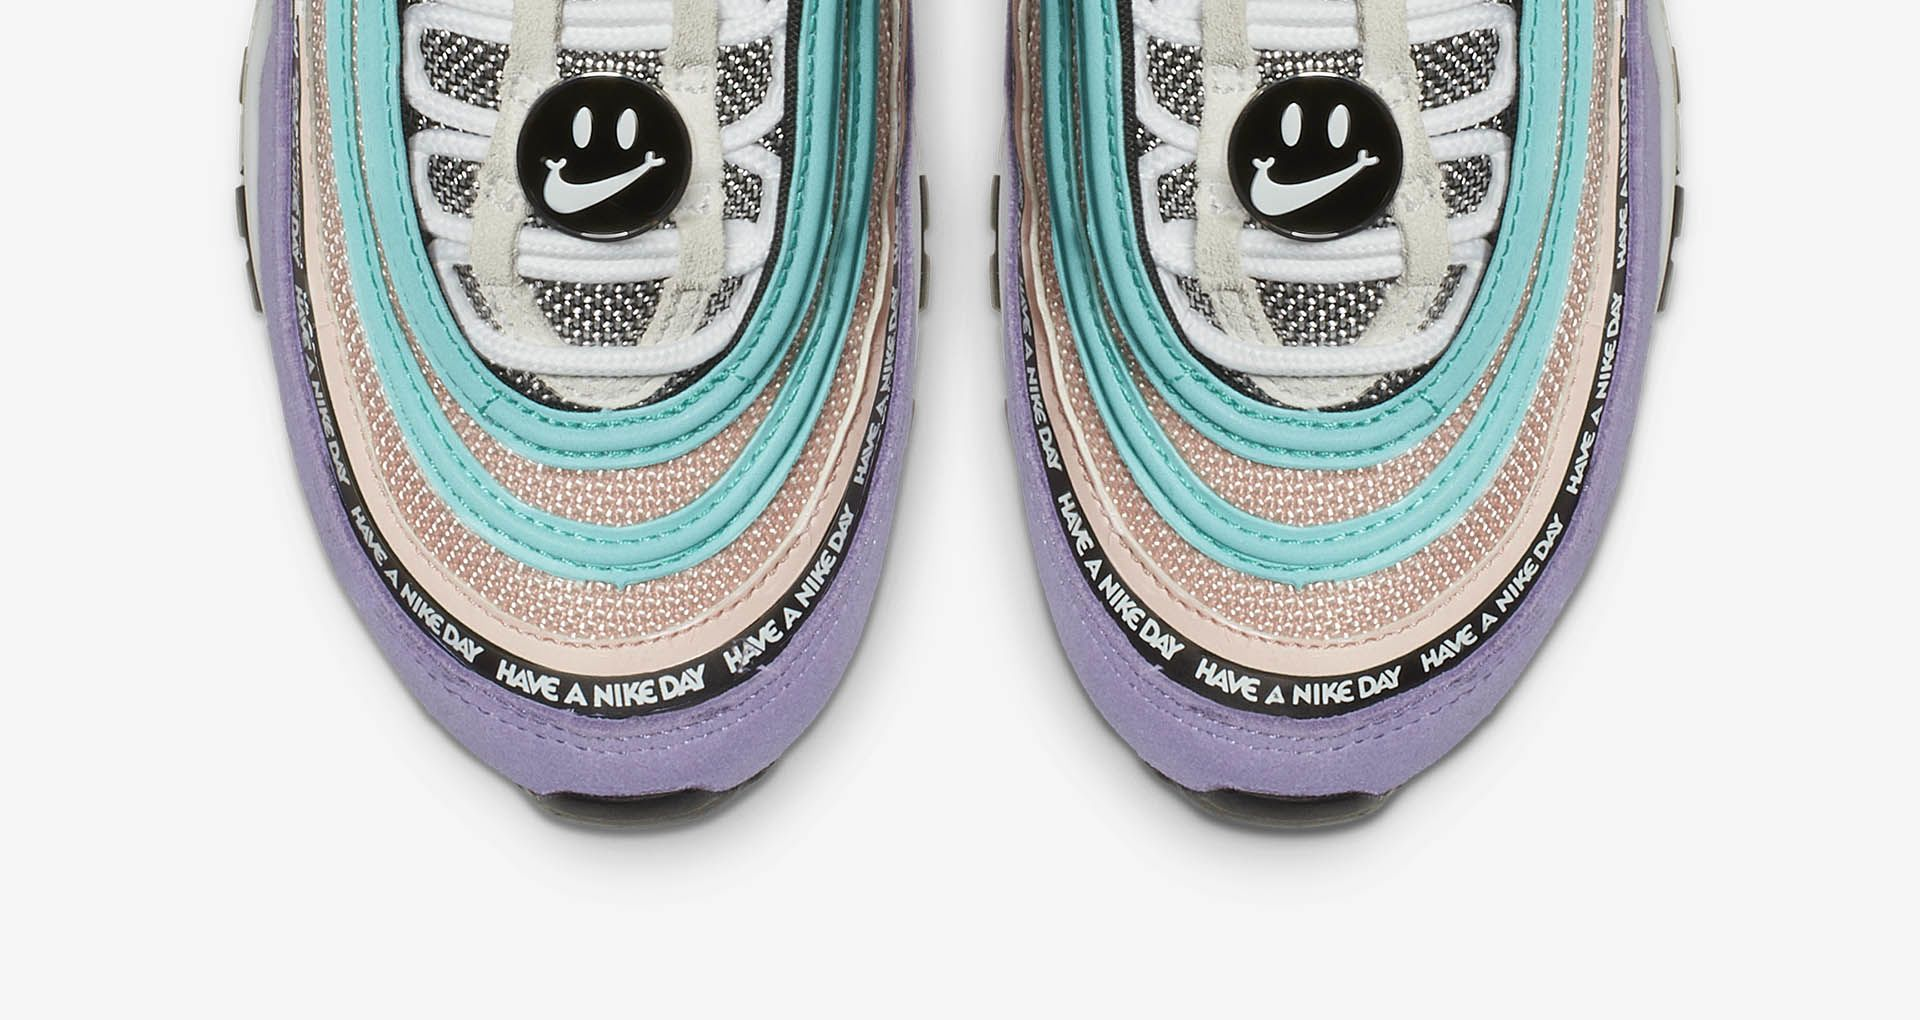 692069e995f 大童Nike Air Max 97 Have A Nike Day 'Space Purple & Black' 发布 ...